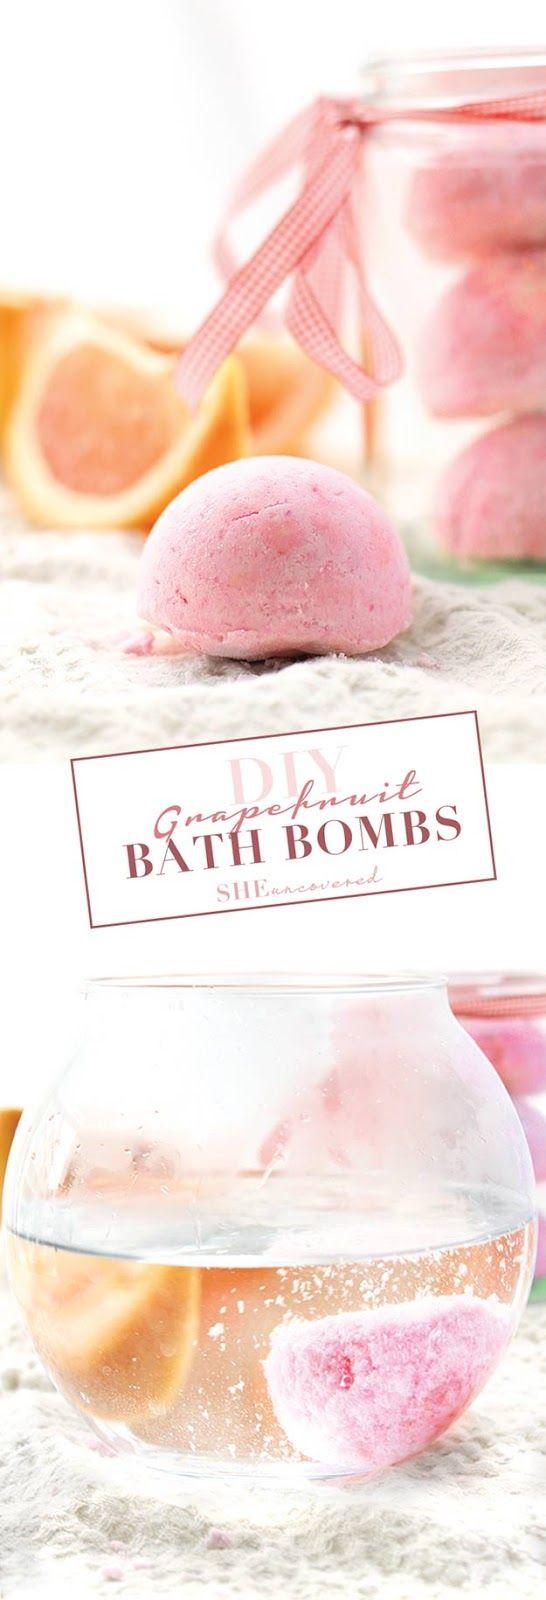 DIY Lush Bath Bombs - The best bath bomb recipes to make you feel good